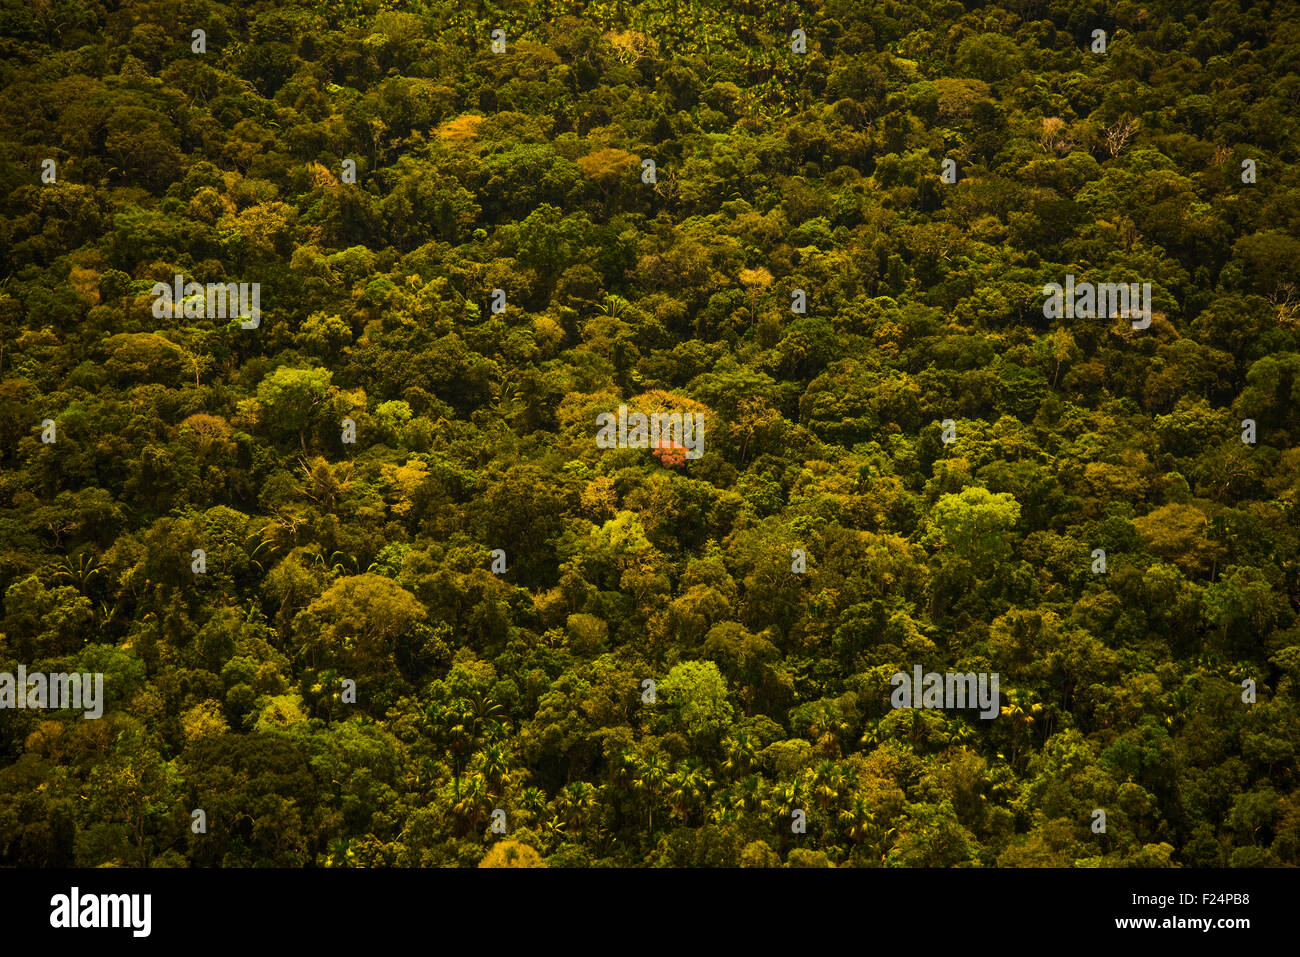 Rainforest aerial, Primary forest, Amazon Region, Peru - Stock Image